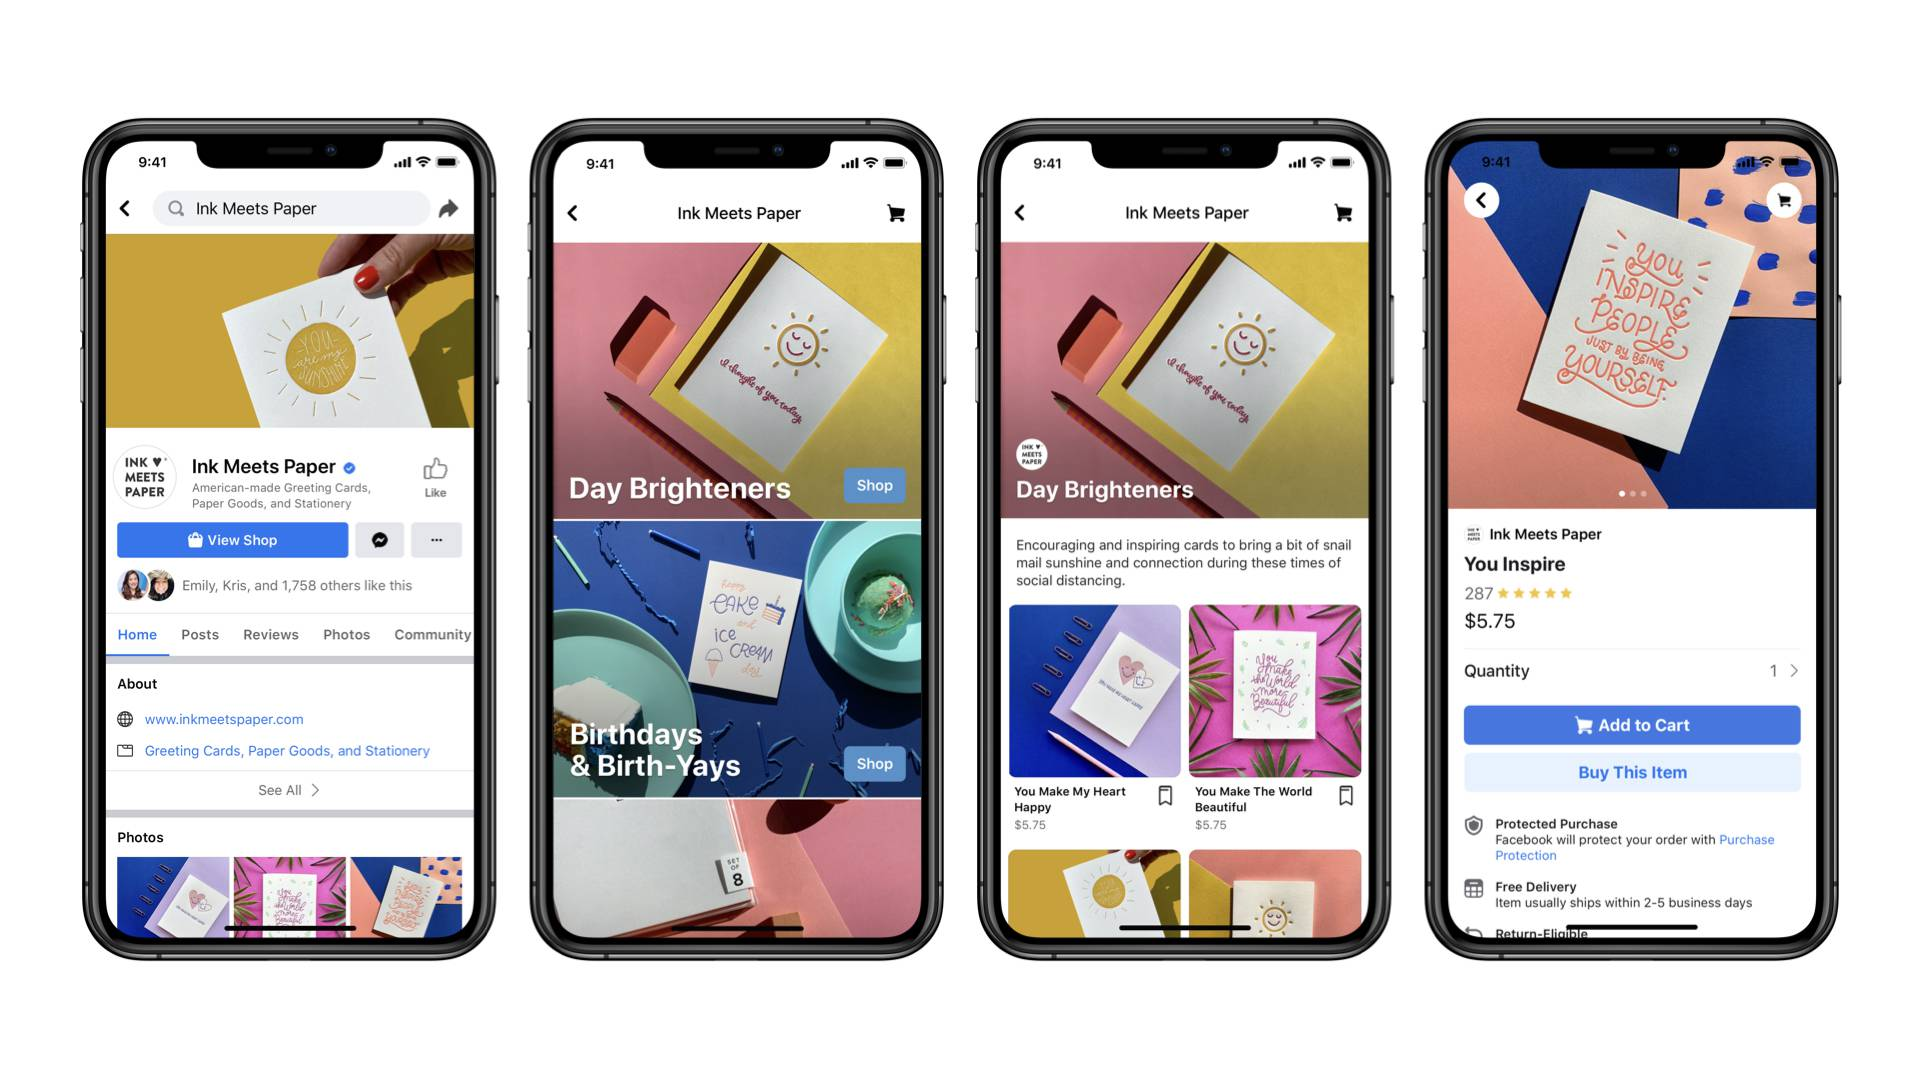 Facebook ima novu značajku: Zuckerberg otvorio FB Shop